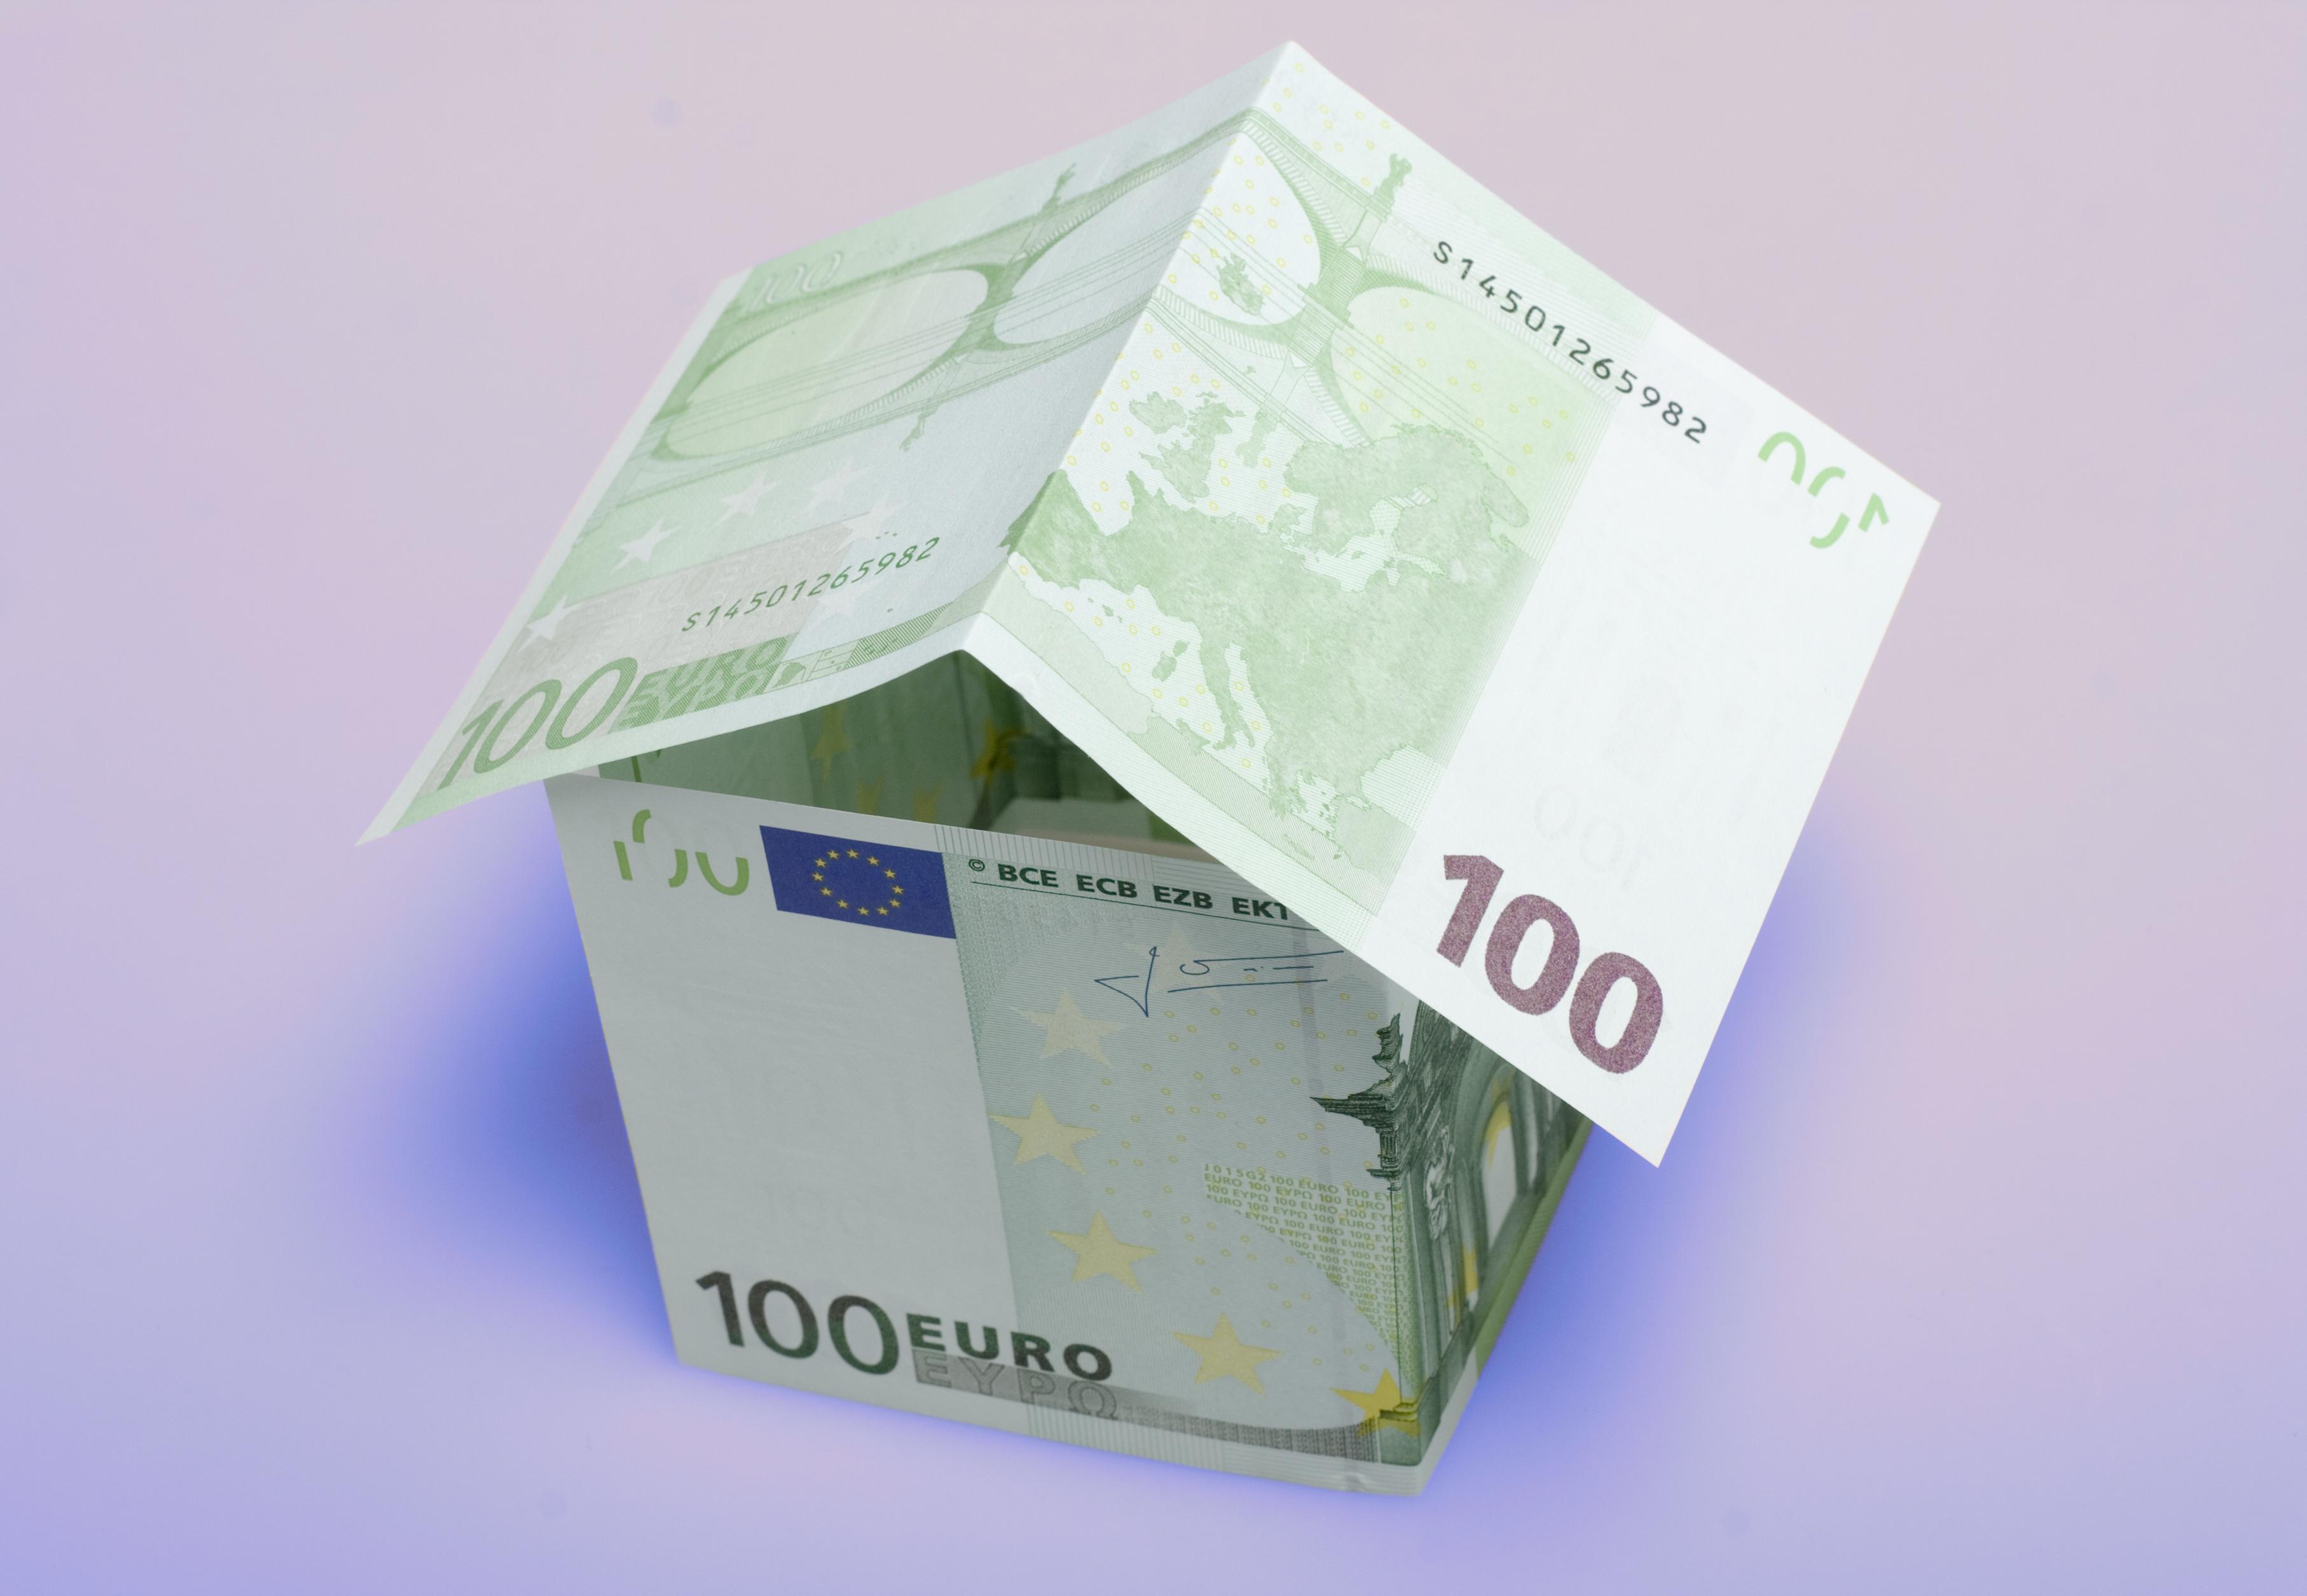 Money house, Bills, Photo, Investment, Landlord, HQ Photo